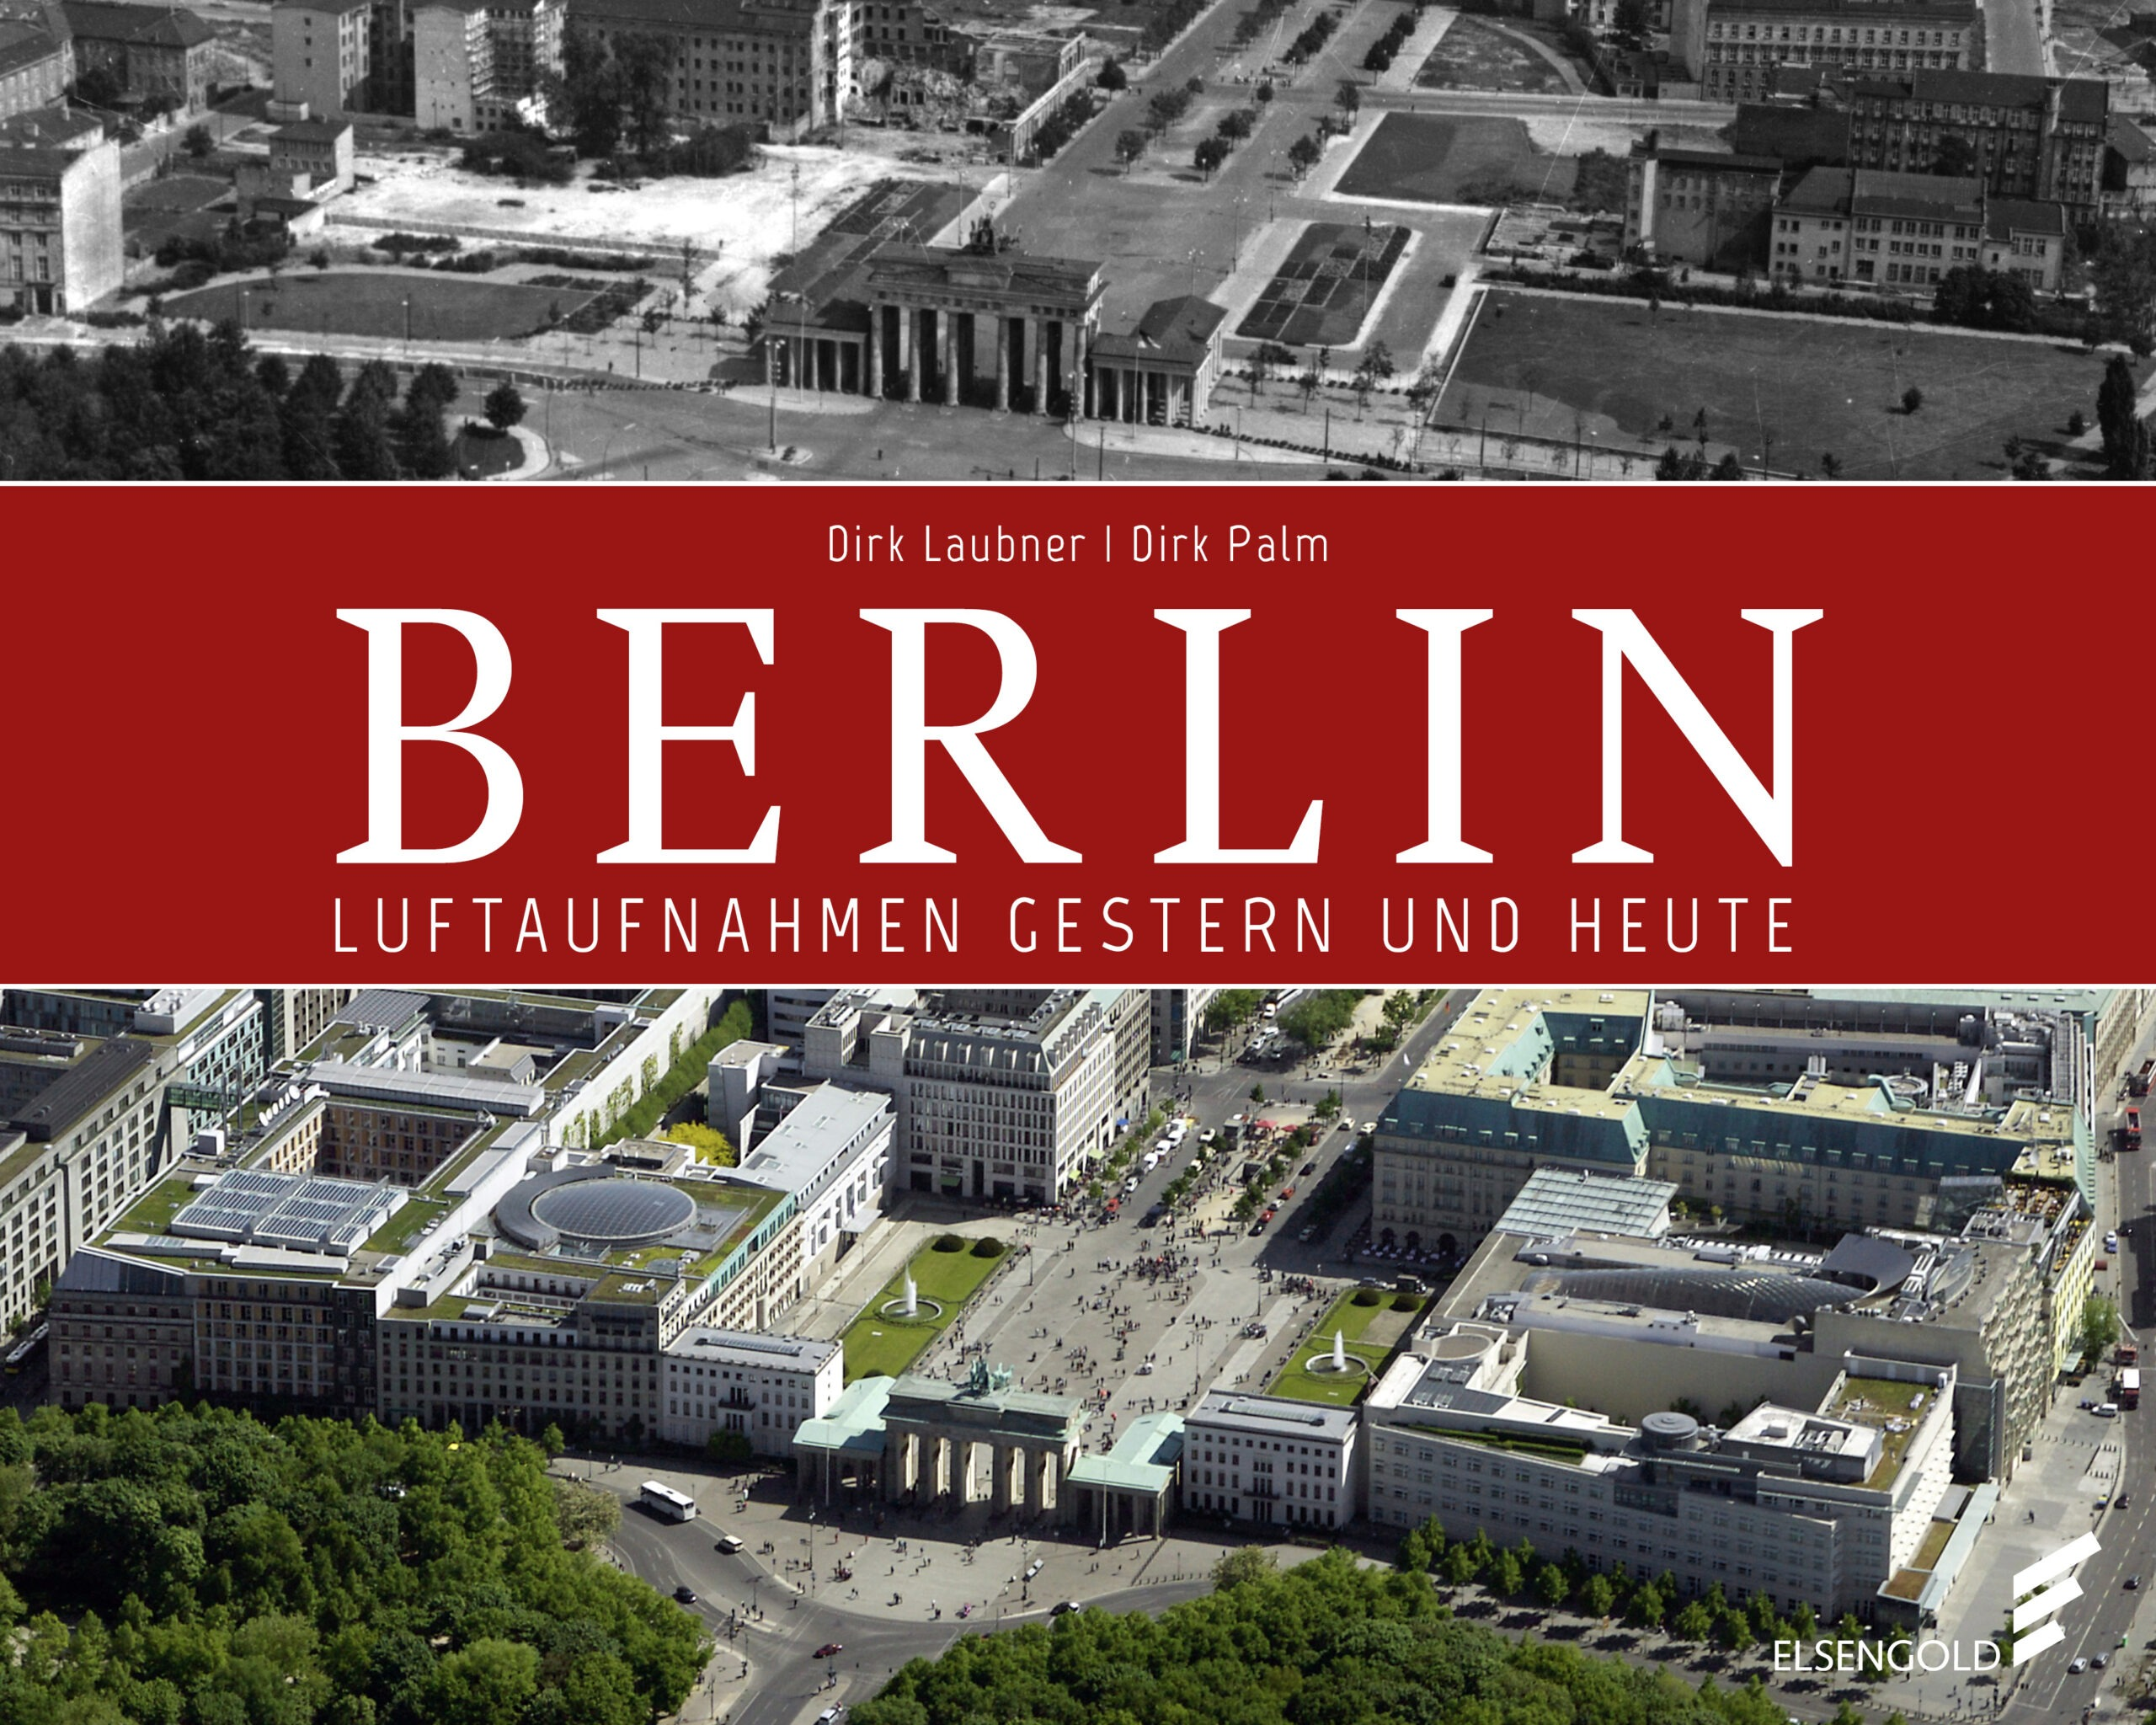 Berlin Luftaufnhamen